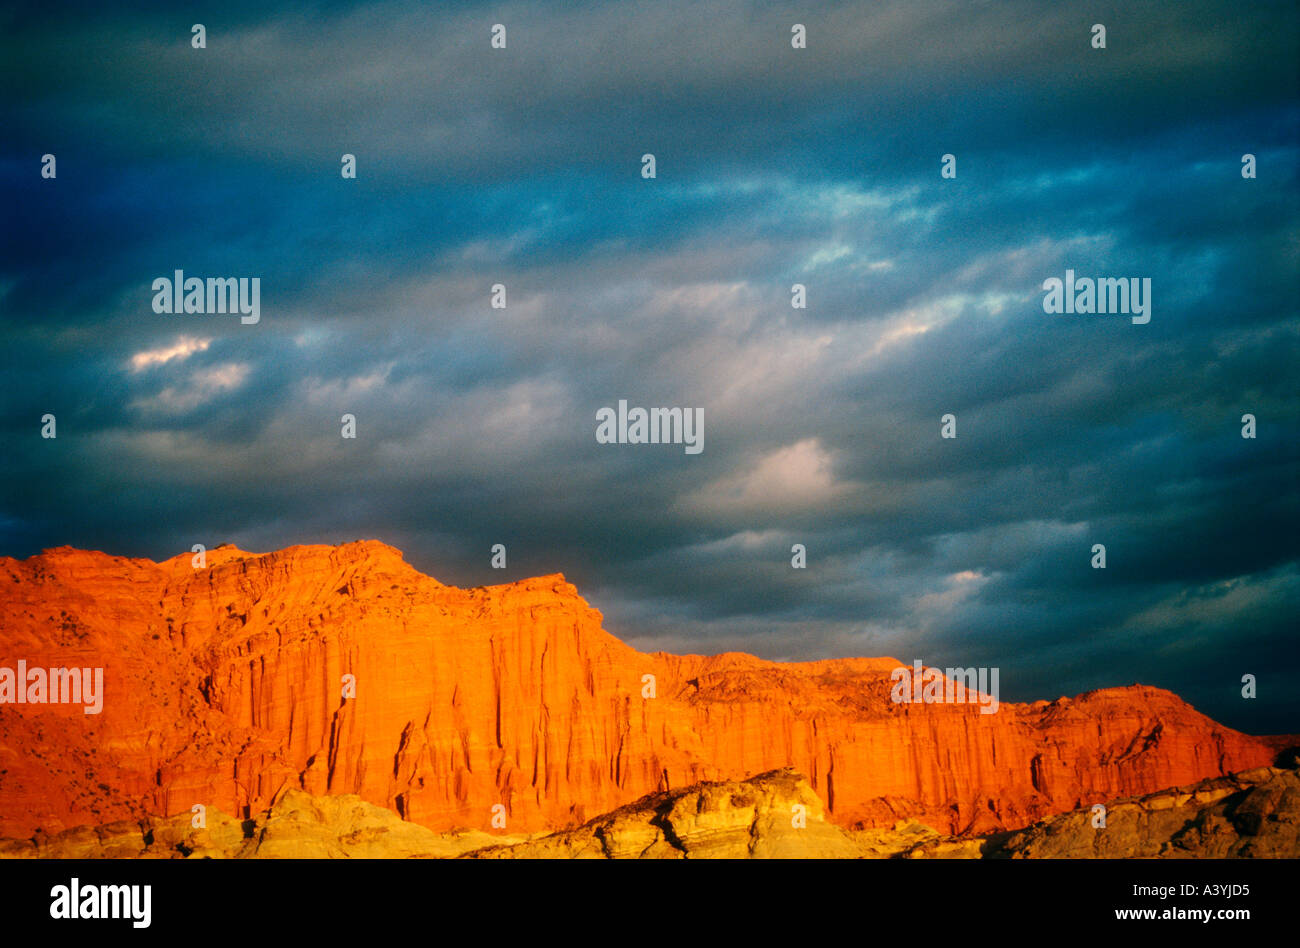 Sunset at Ischigualasto Triassic Park in western Argentina - Stock Image